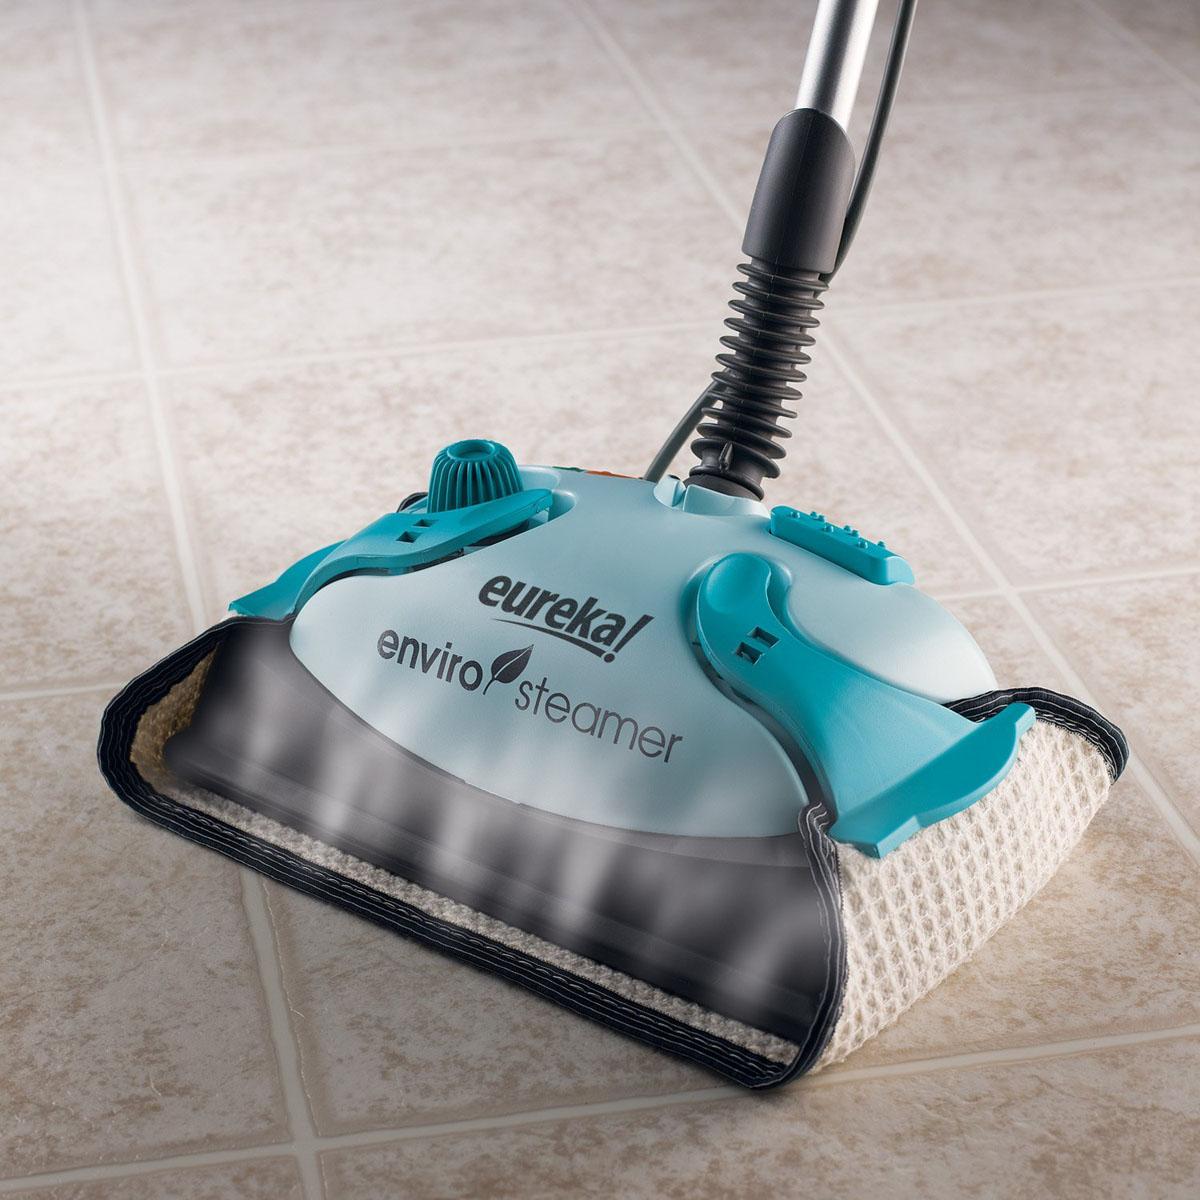 How Good is the Eureka 313A Enviro Hard-Surface Floor Steamer